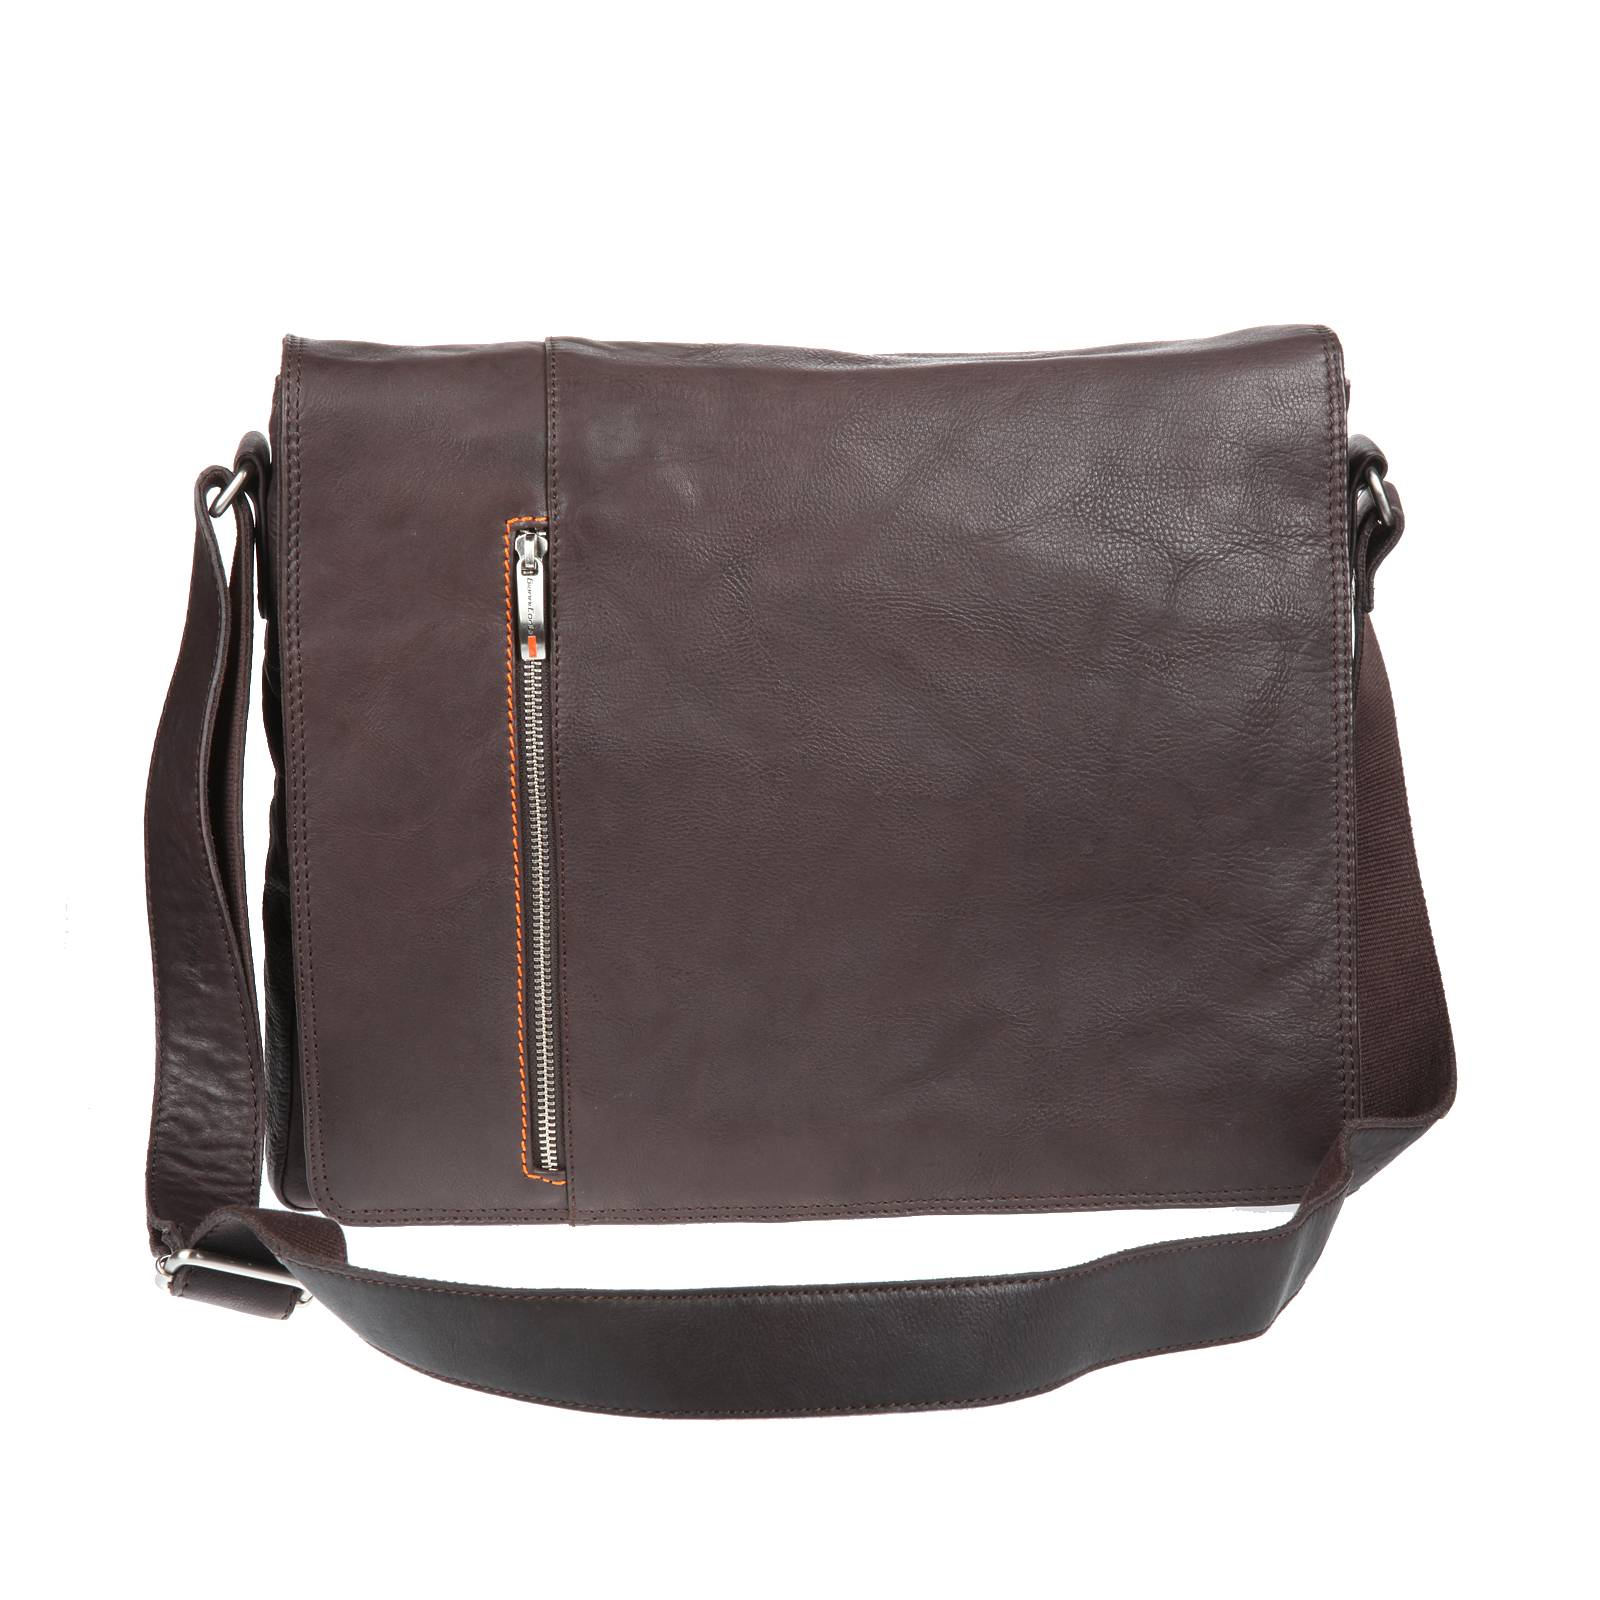 5922126e56fb 12 трендов в мужских сумках с недели моды в Париже